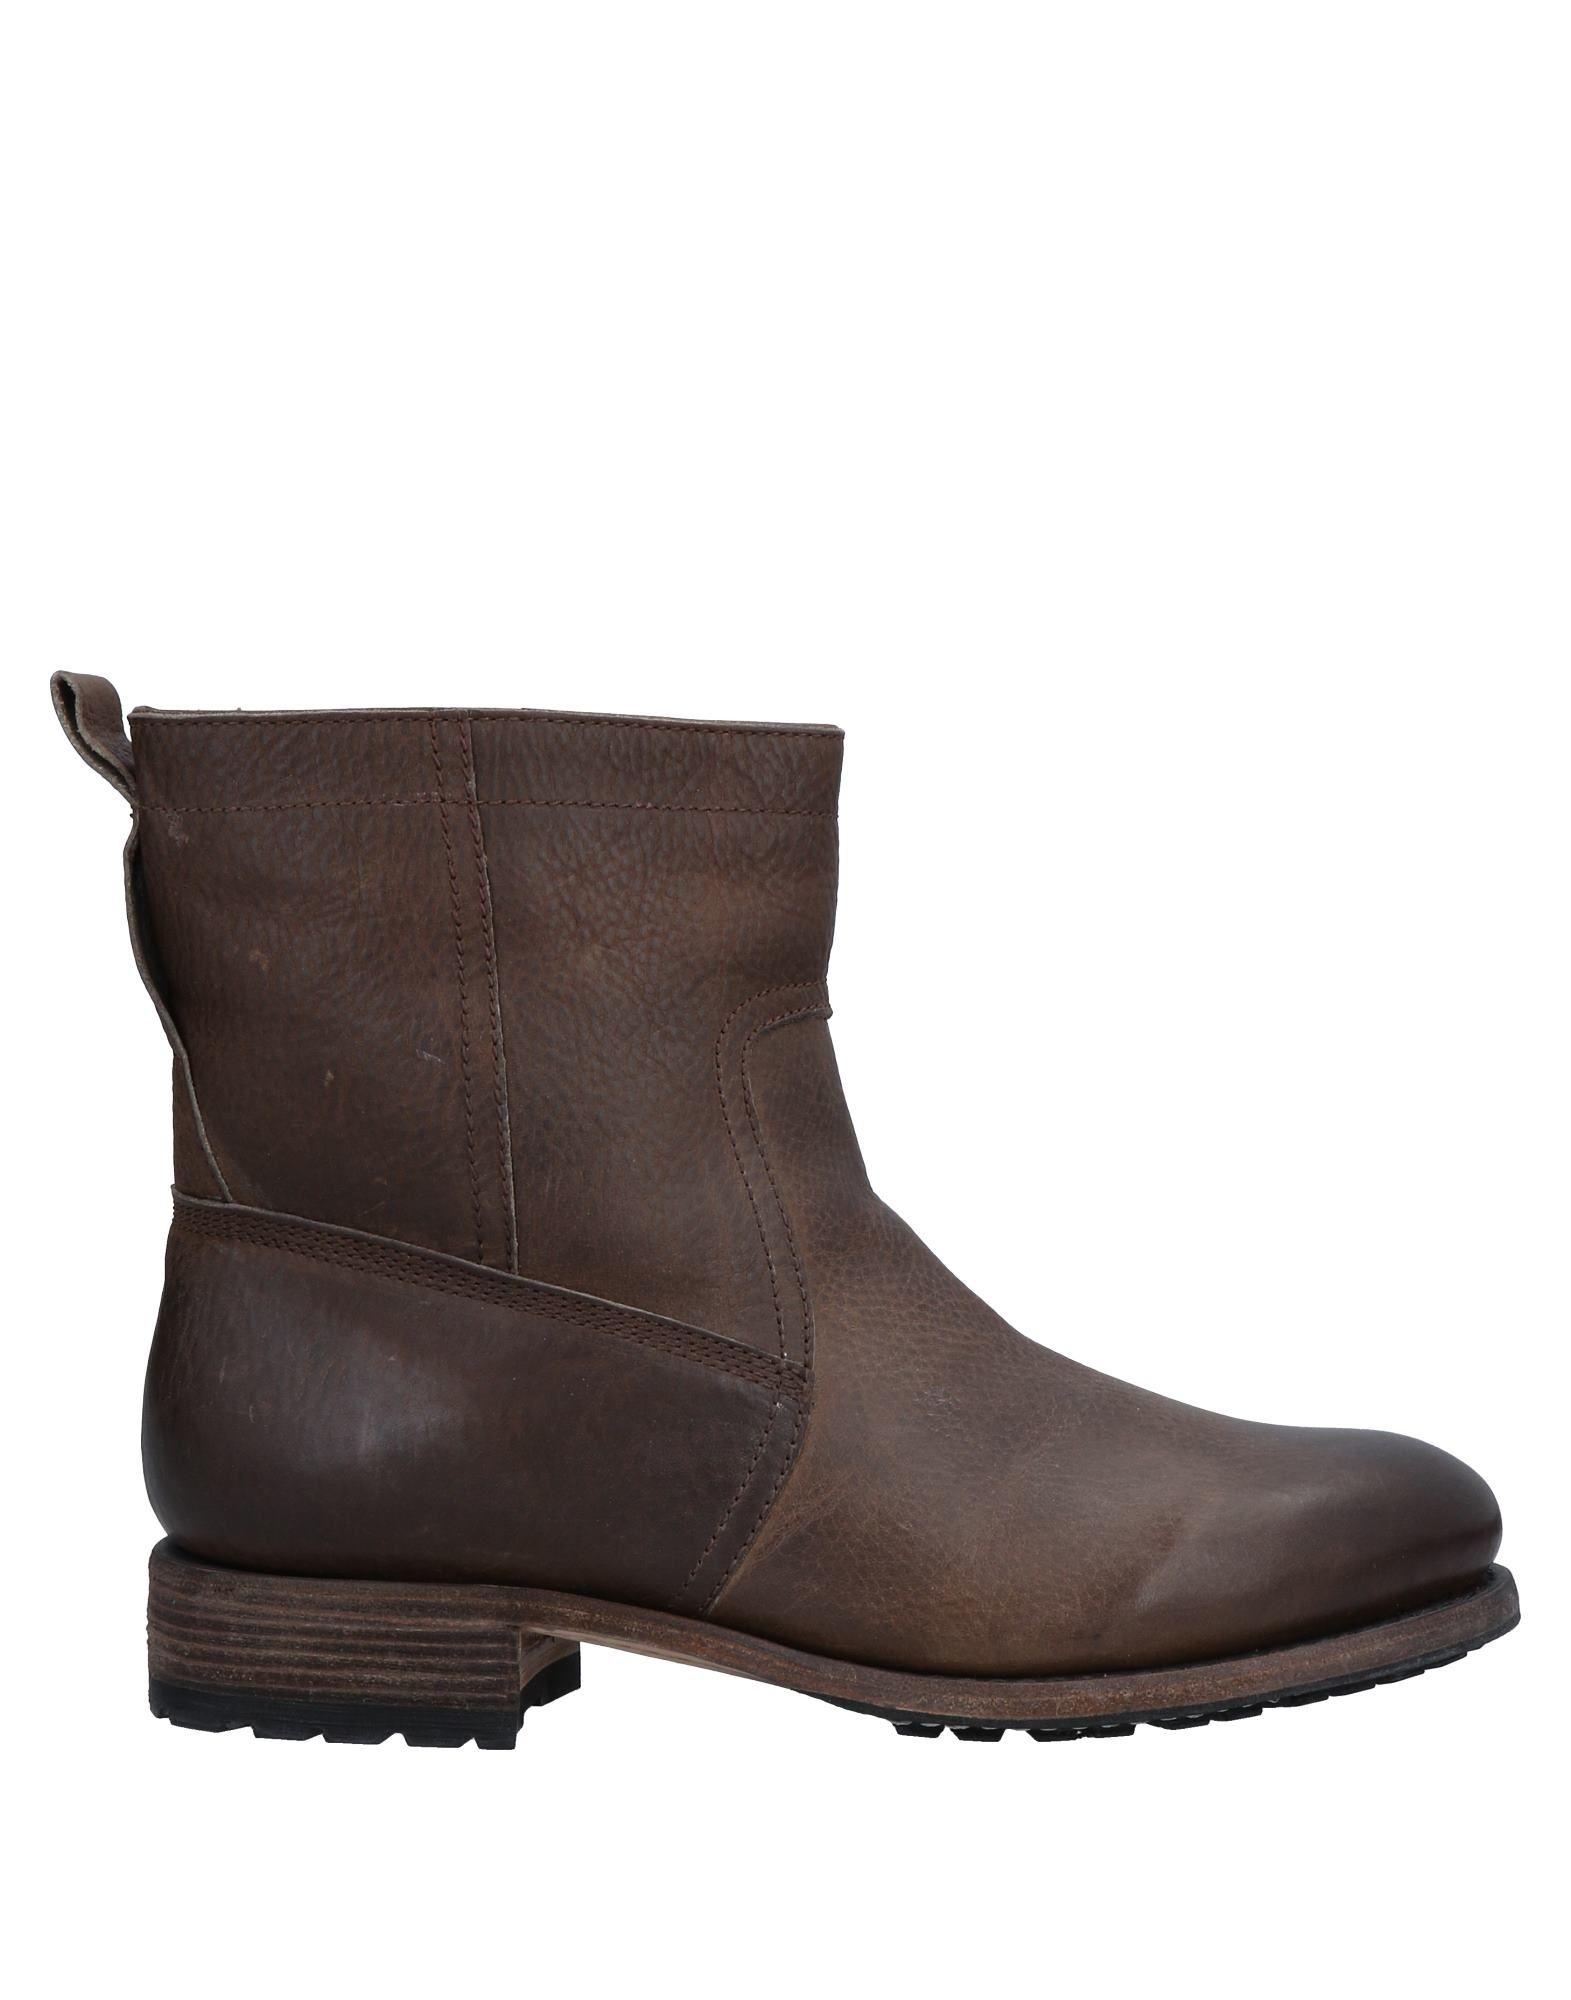 BLACKSTONE Полусапоги и высокие ботинки ston blackstone relay nh3 c